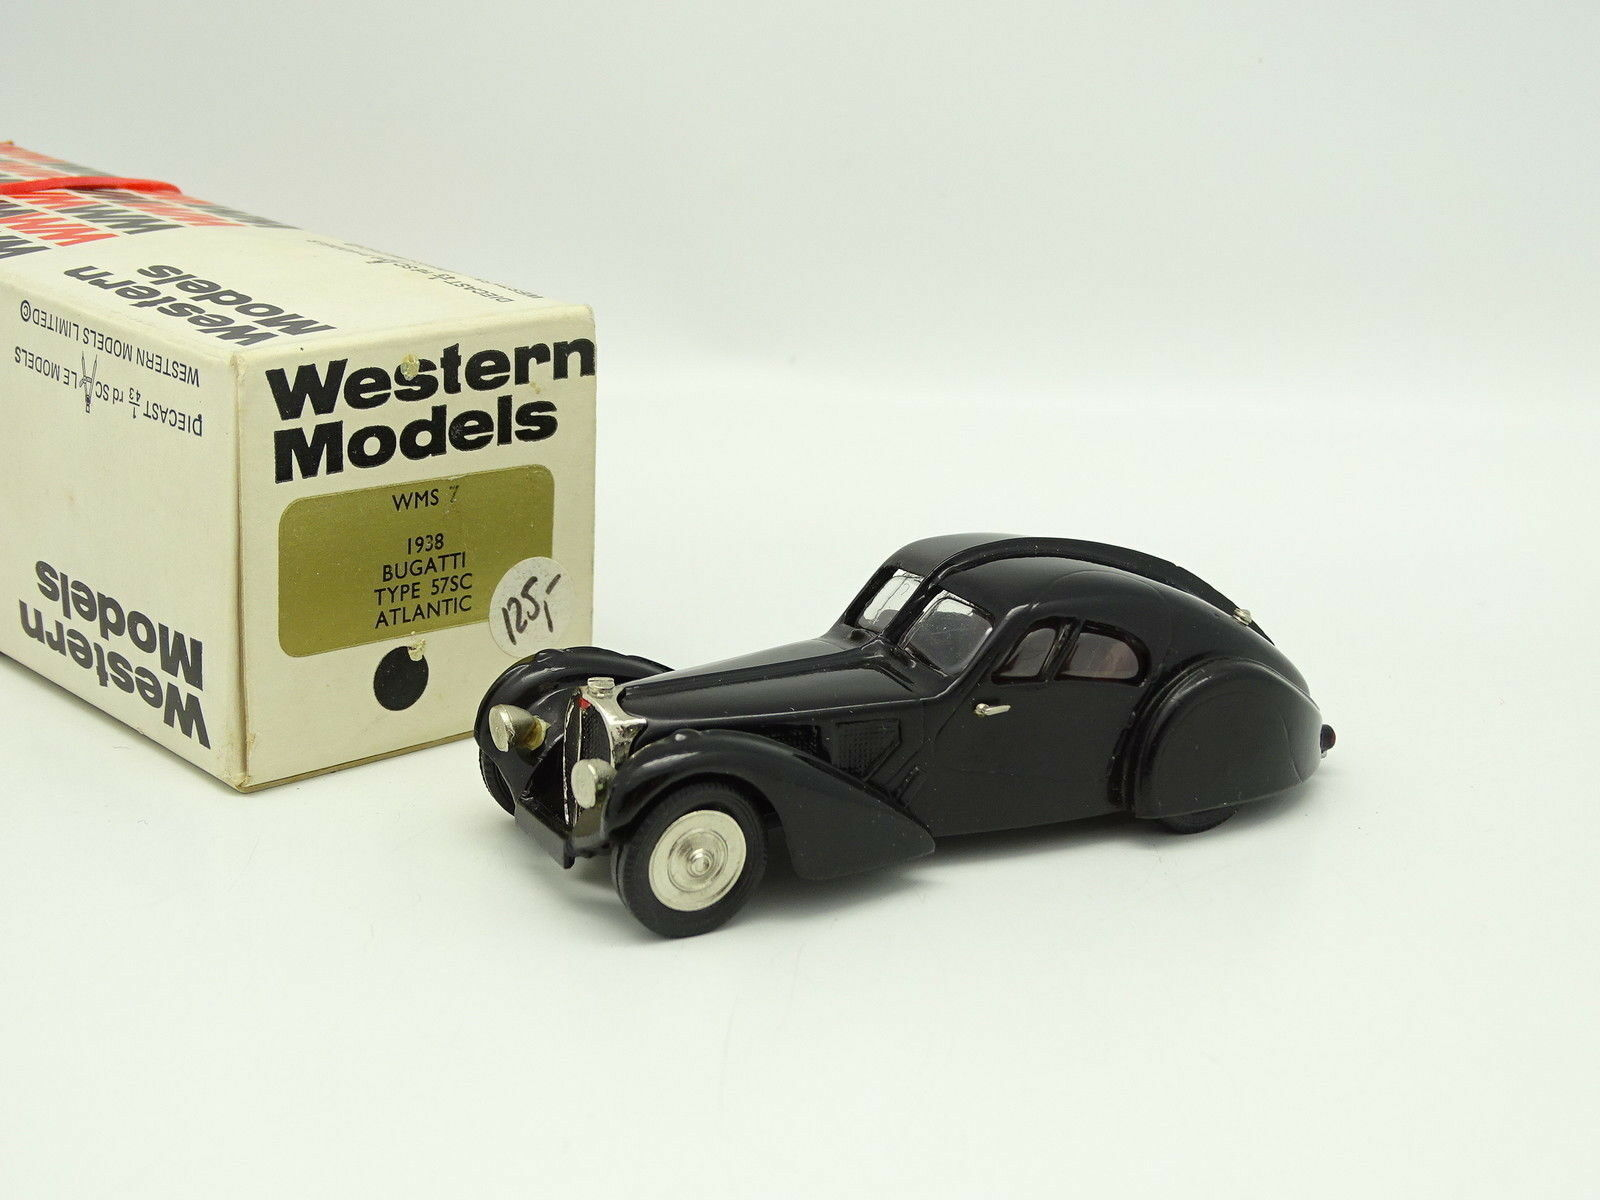 Western Models 1 43 - Bugatti 57SC Atlantic Noire 1938